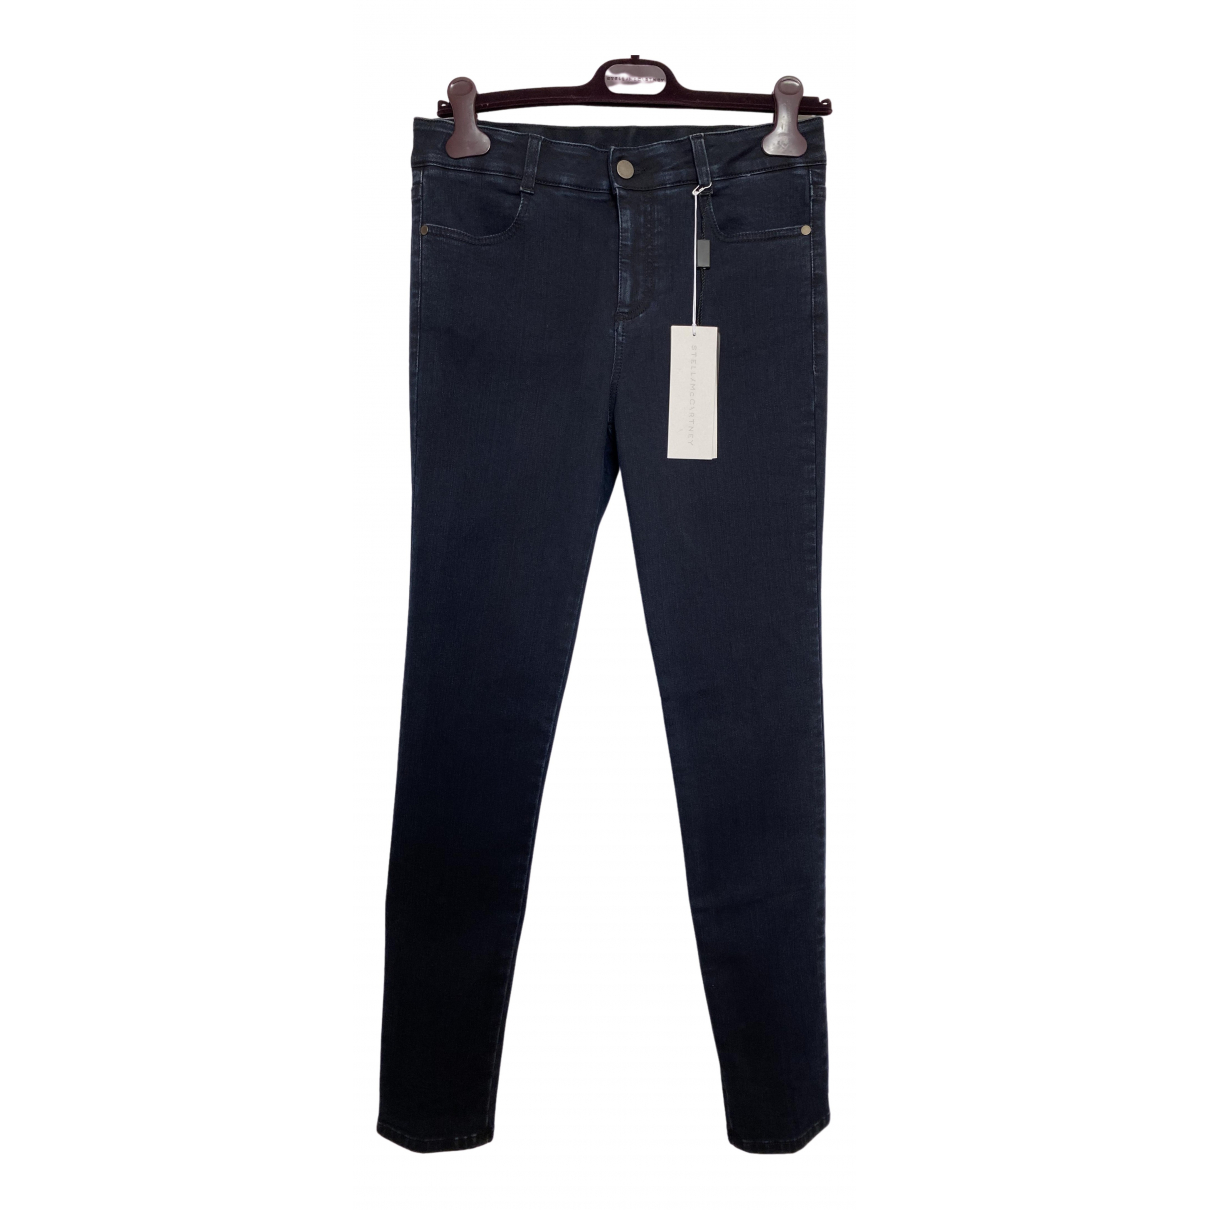 Stella Mccartney \N Navy Cotton - elasthane Jeans for Women 28 US